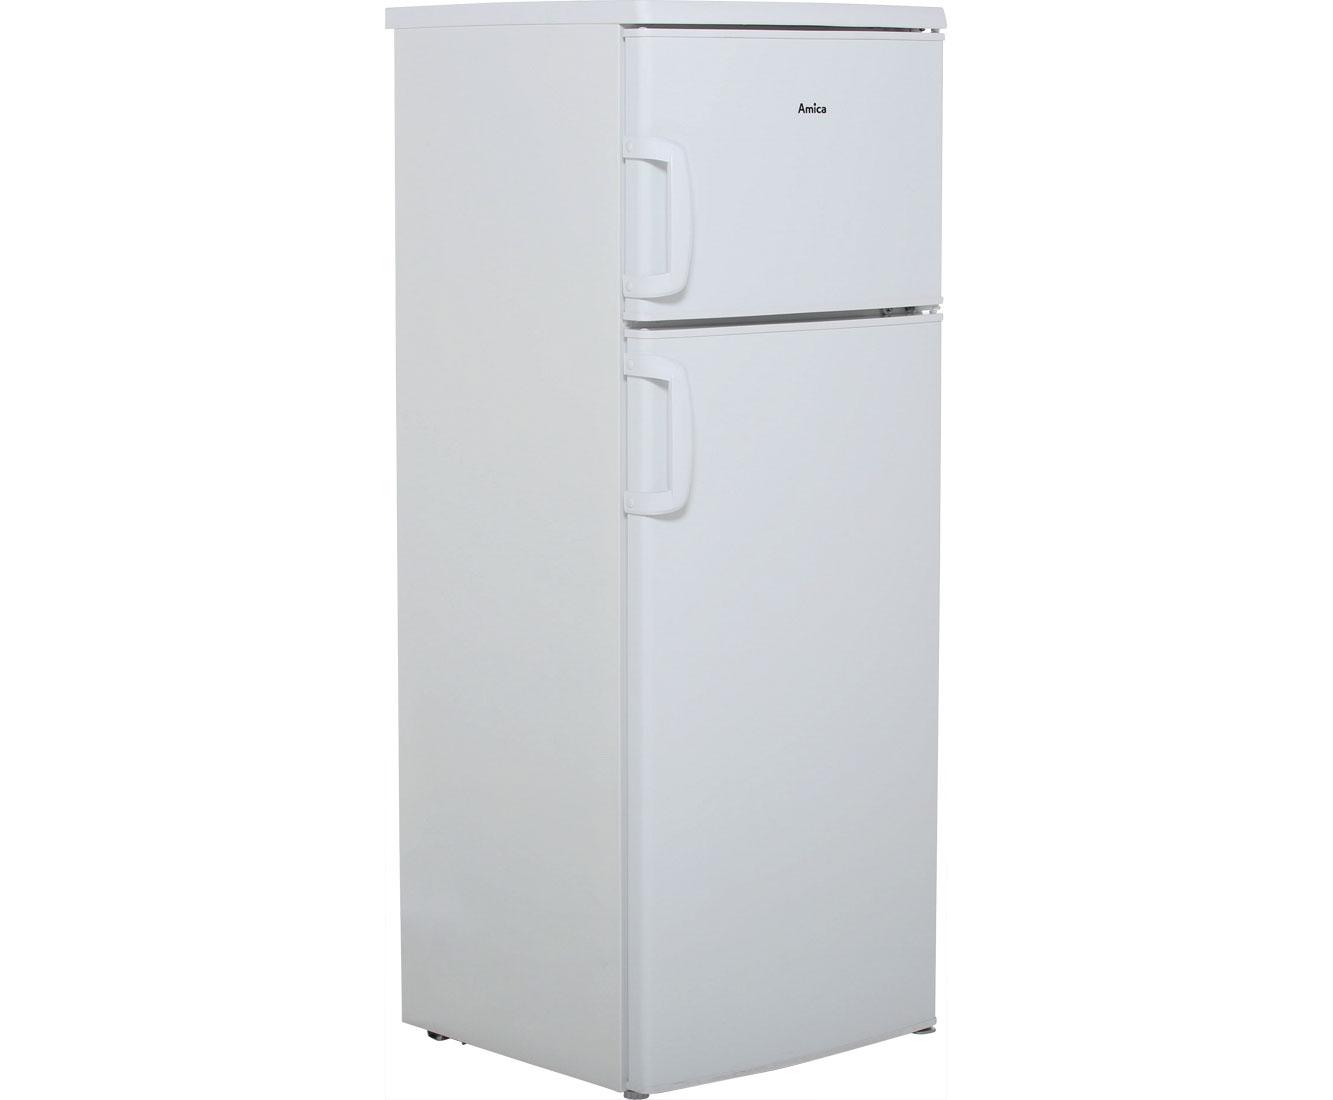 Bomann Kühlschrank Expert : Rabatt preisvergleich.de haushaltsgeräte u003e kühlen & gefrieren